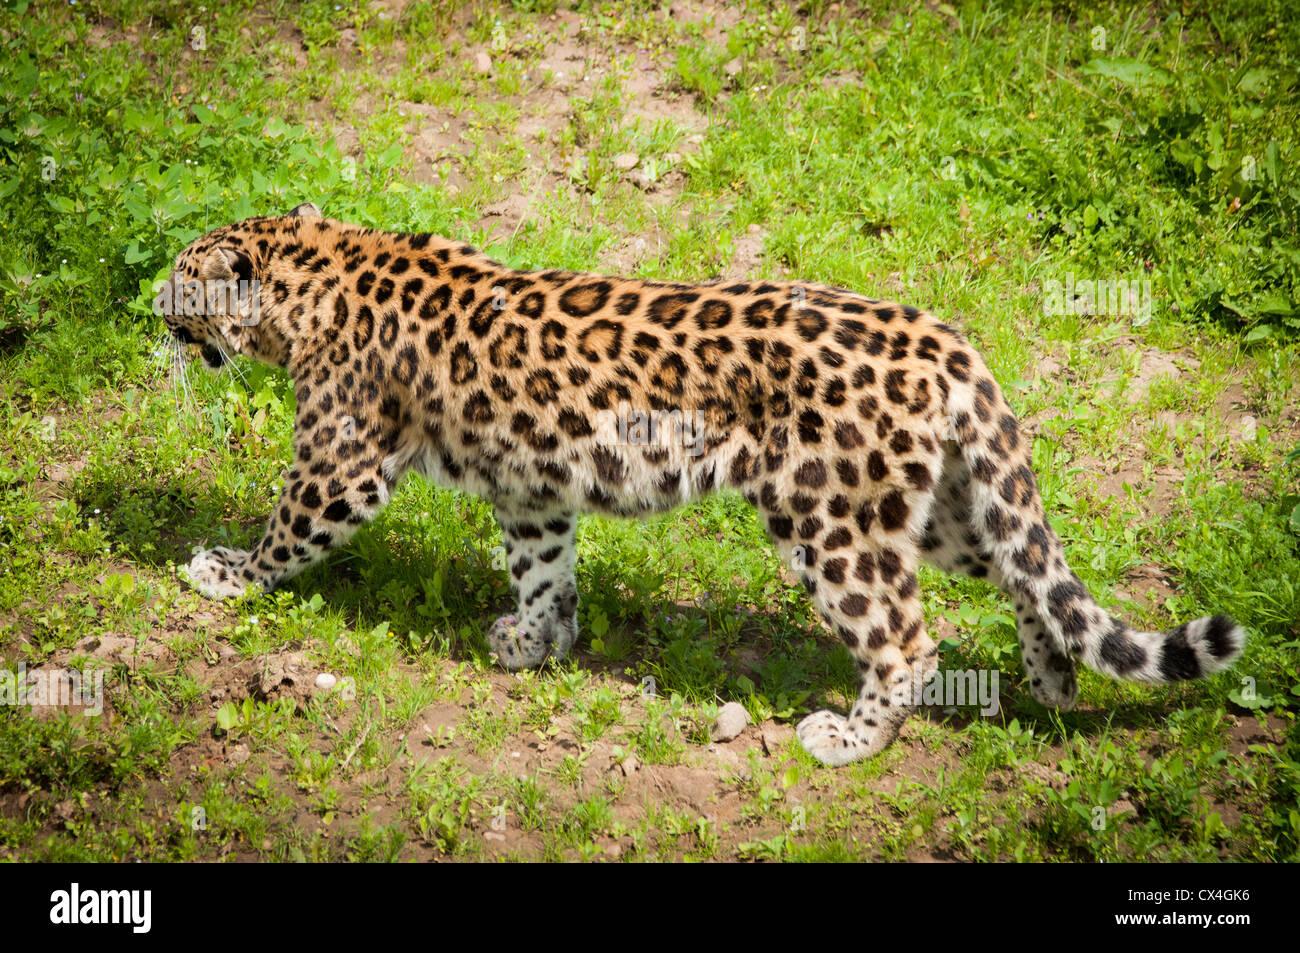 An Amur Leopard walking in grass - Stock Image